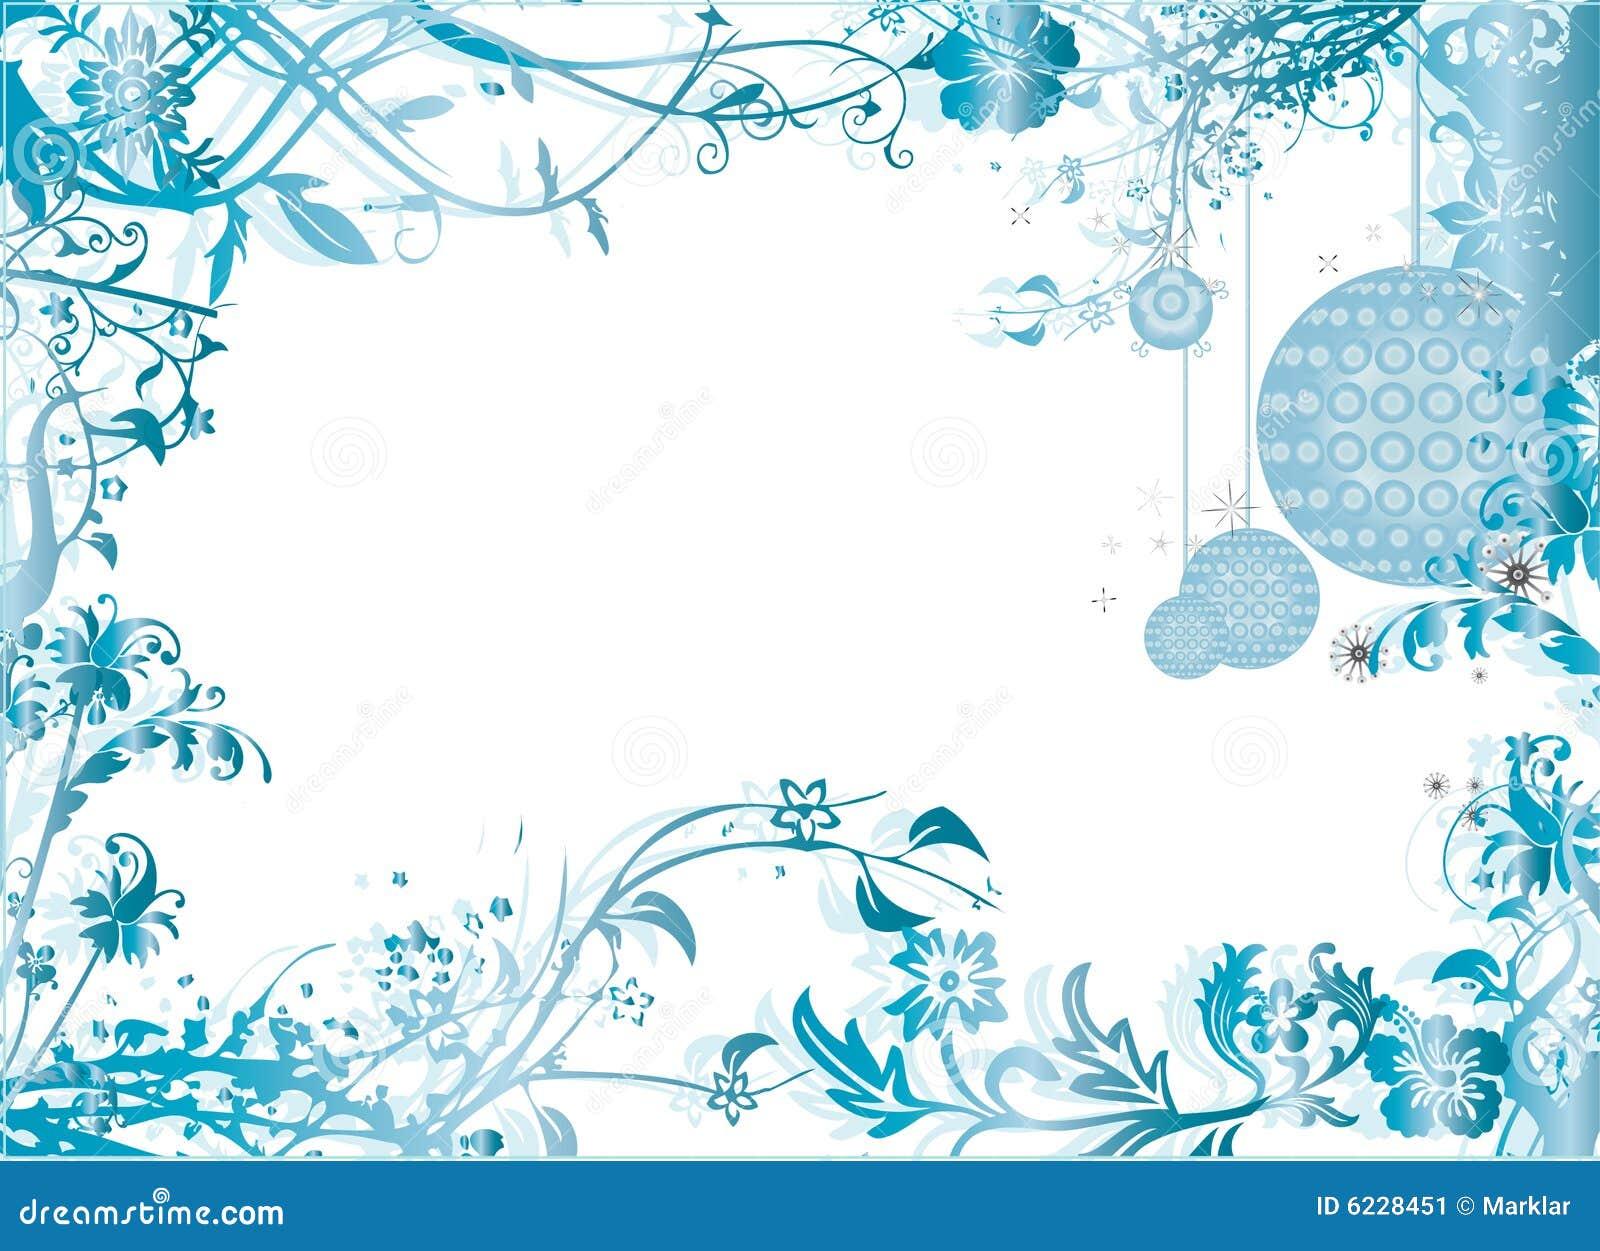 Fence png transparent images png all - Blue Christmas Frame Pattern Vector Illustration Stock